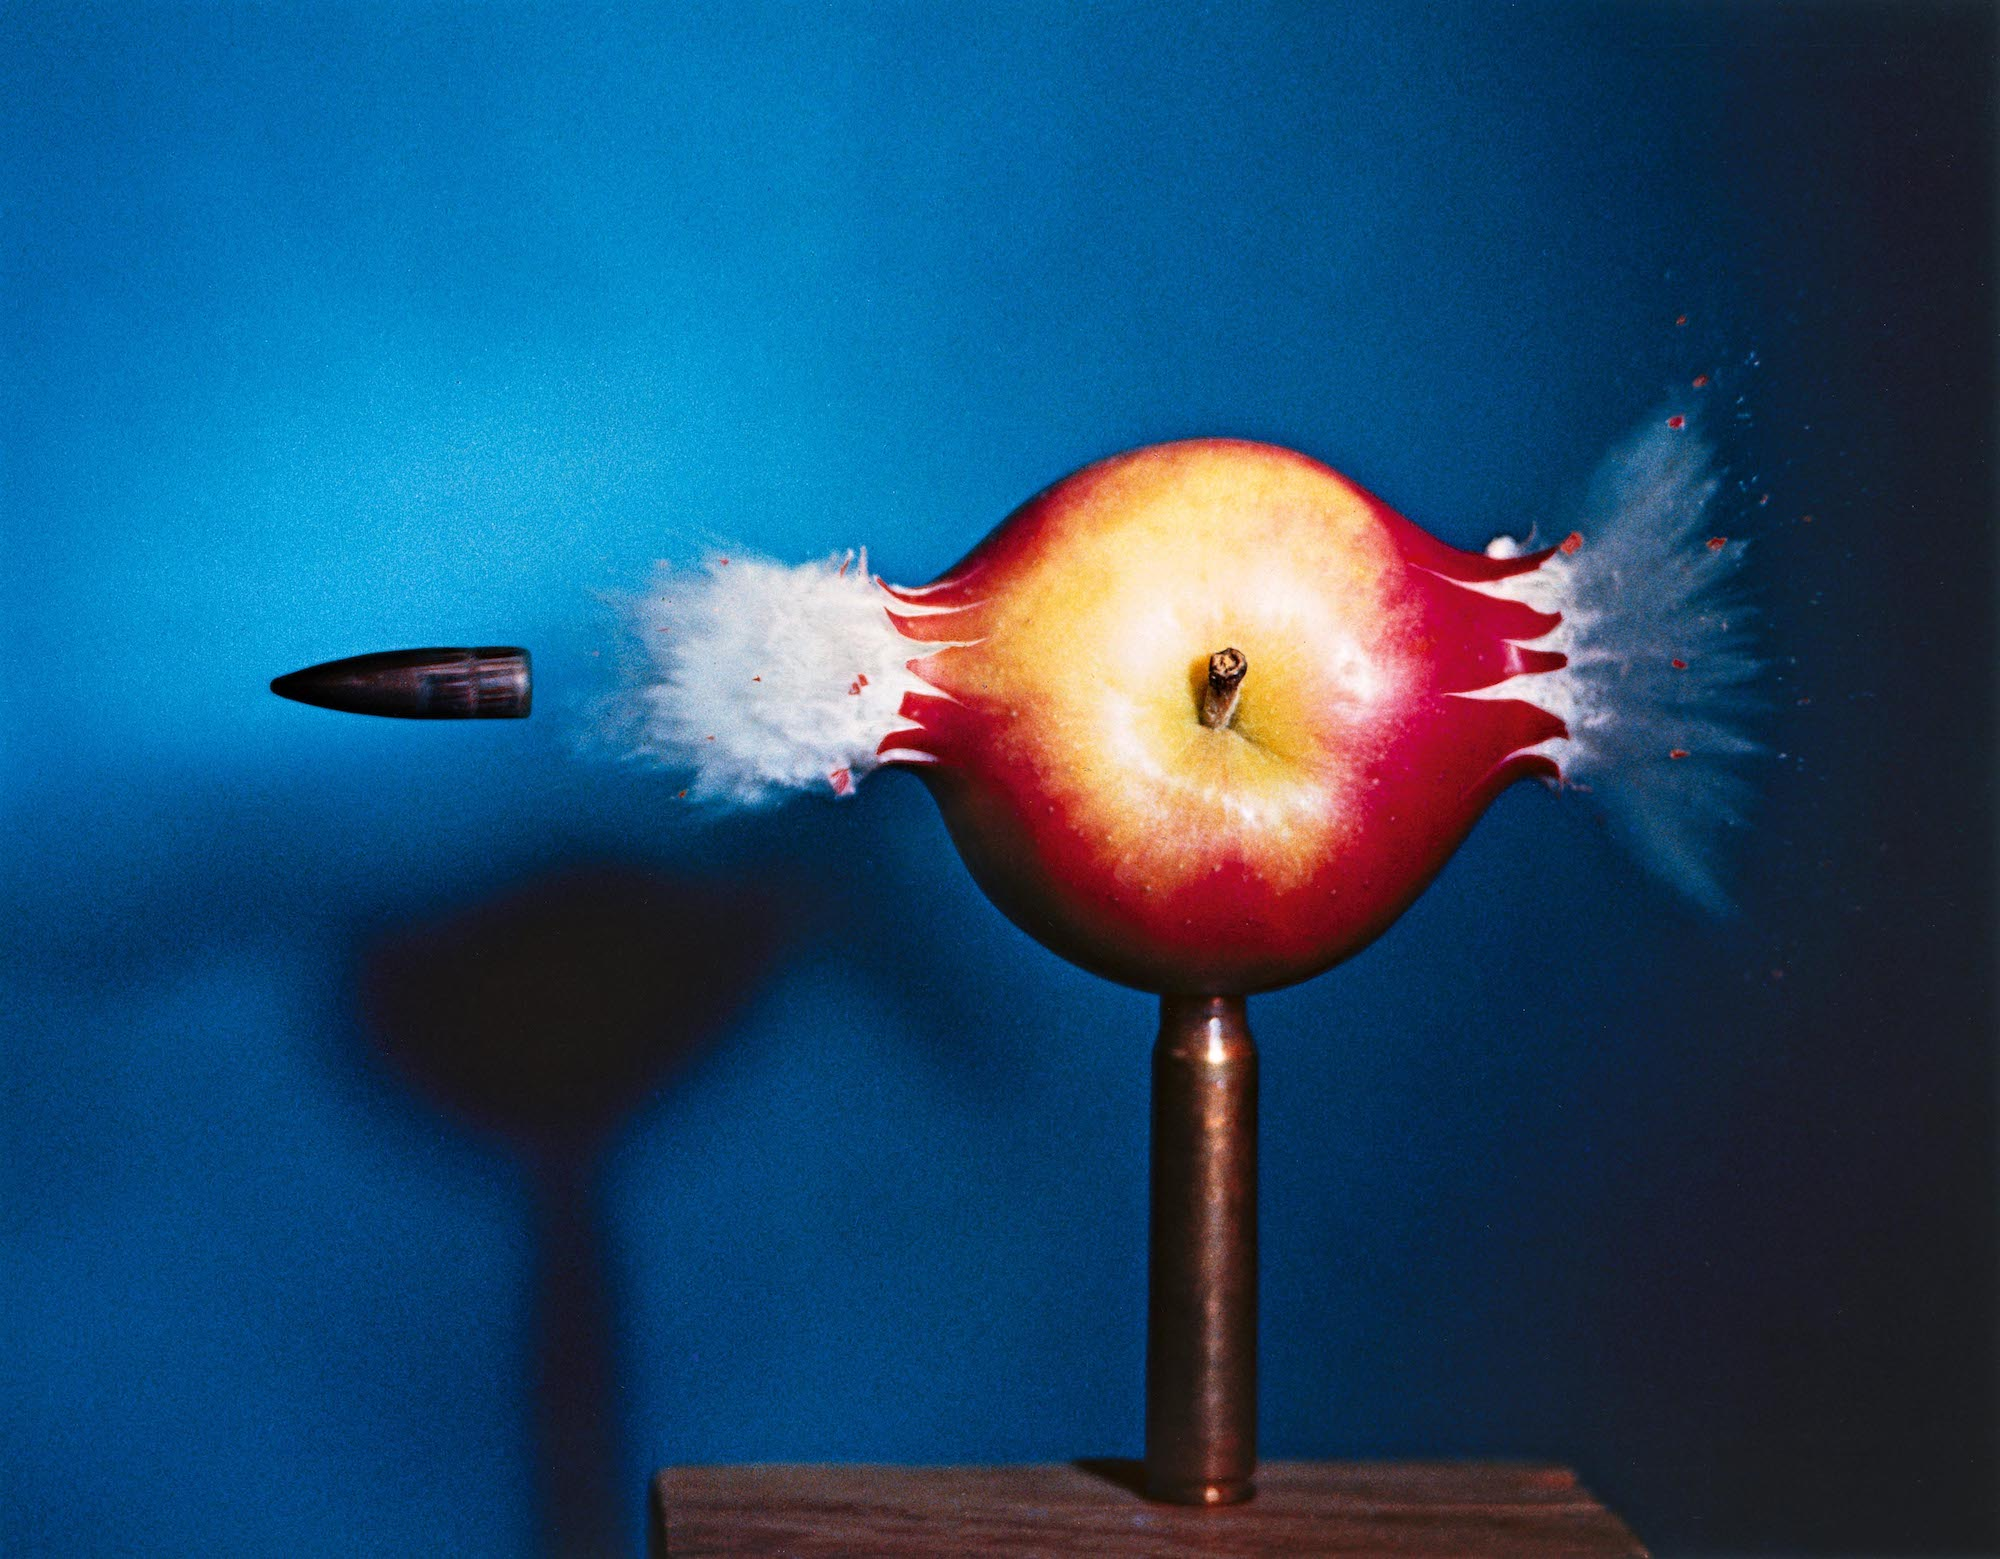 Bullet through Apple, 1964, by Harold Edgerton